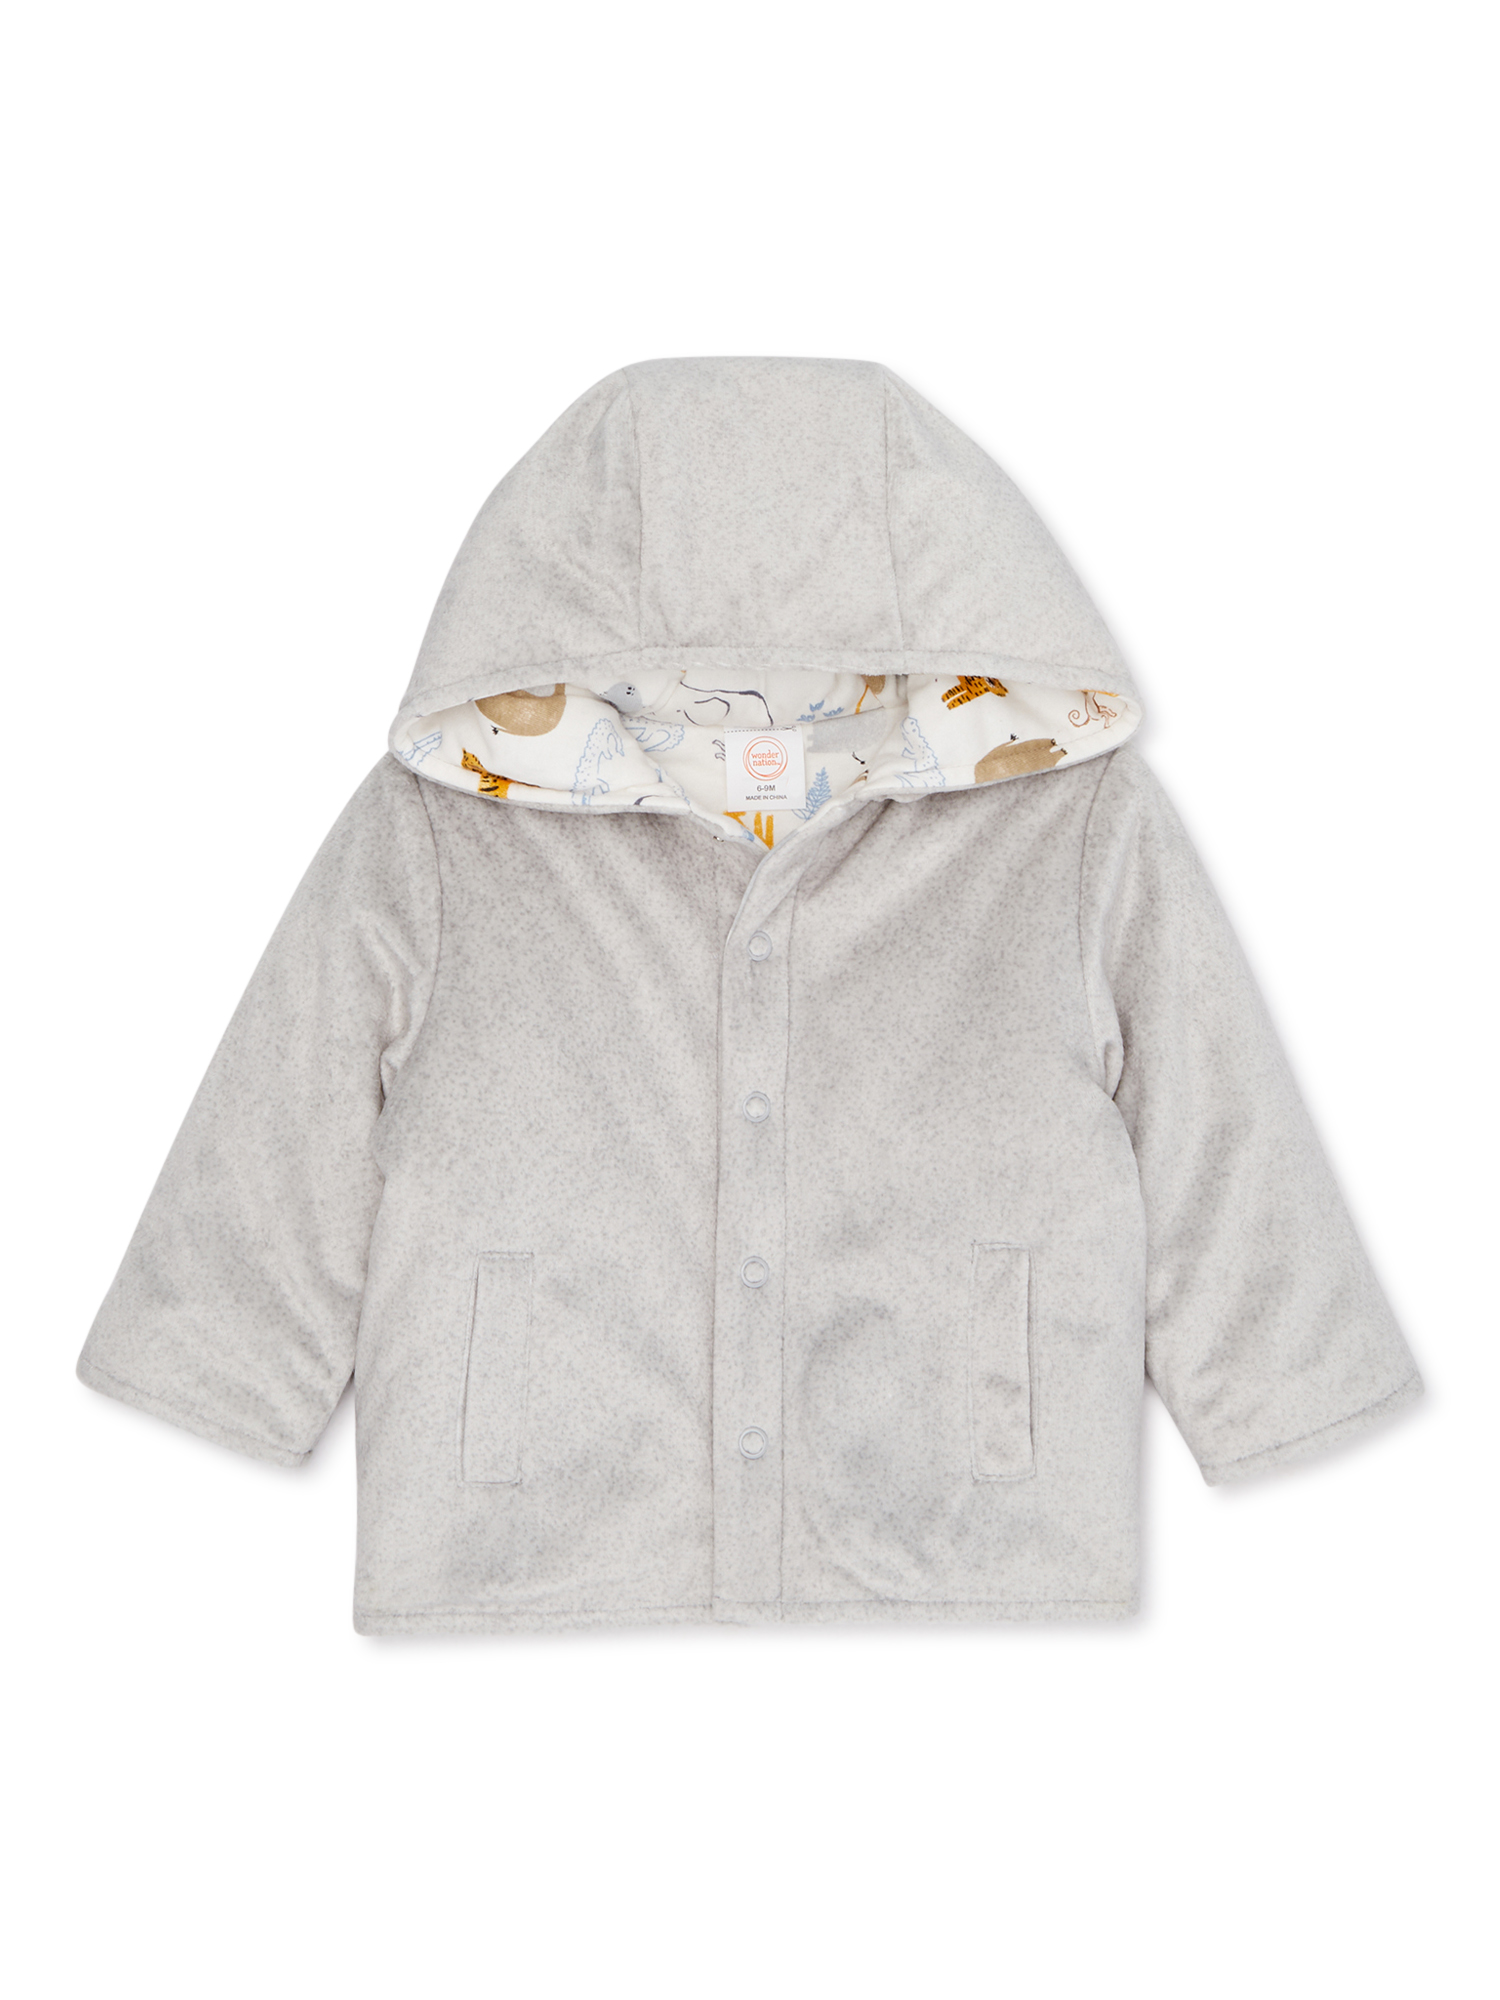 5 Best / 5 Worst Products to Find on Sale at Walmart |Walmart Baby Jackets